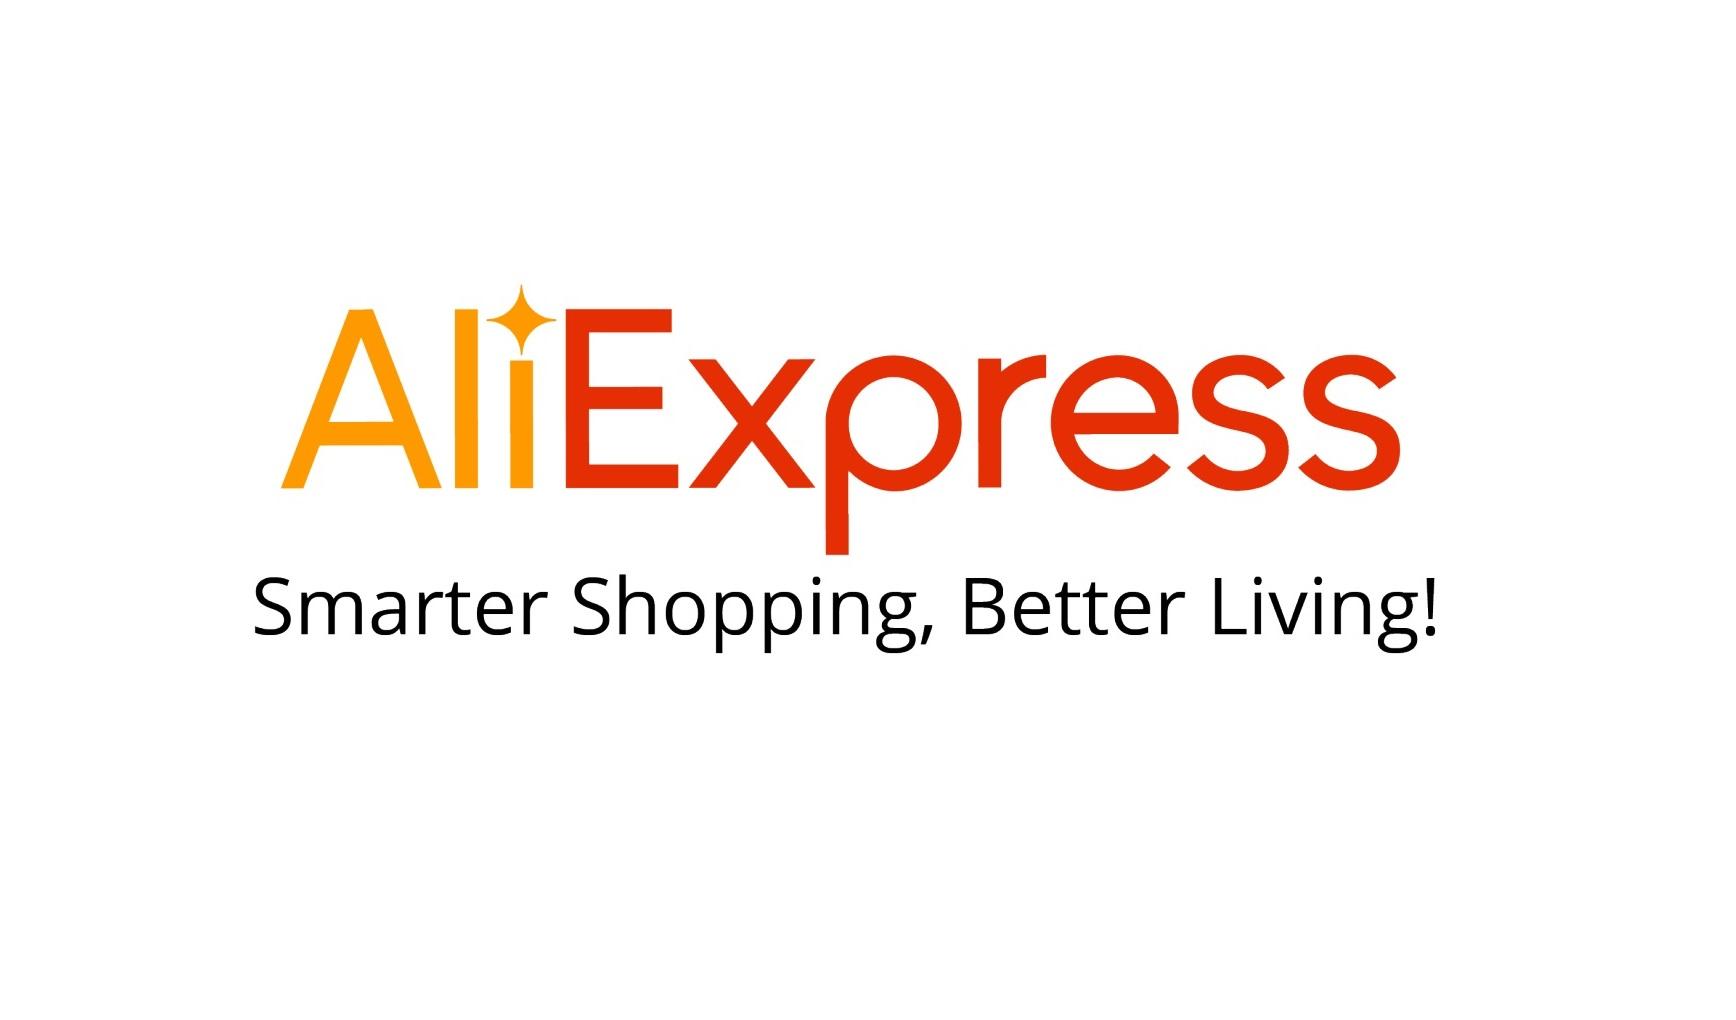 AliExpress.